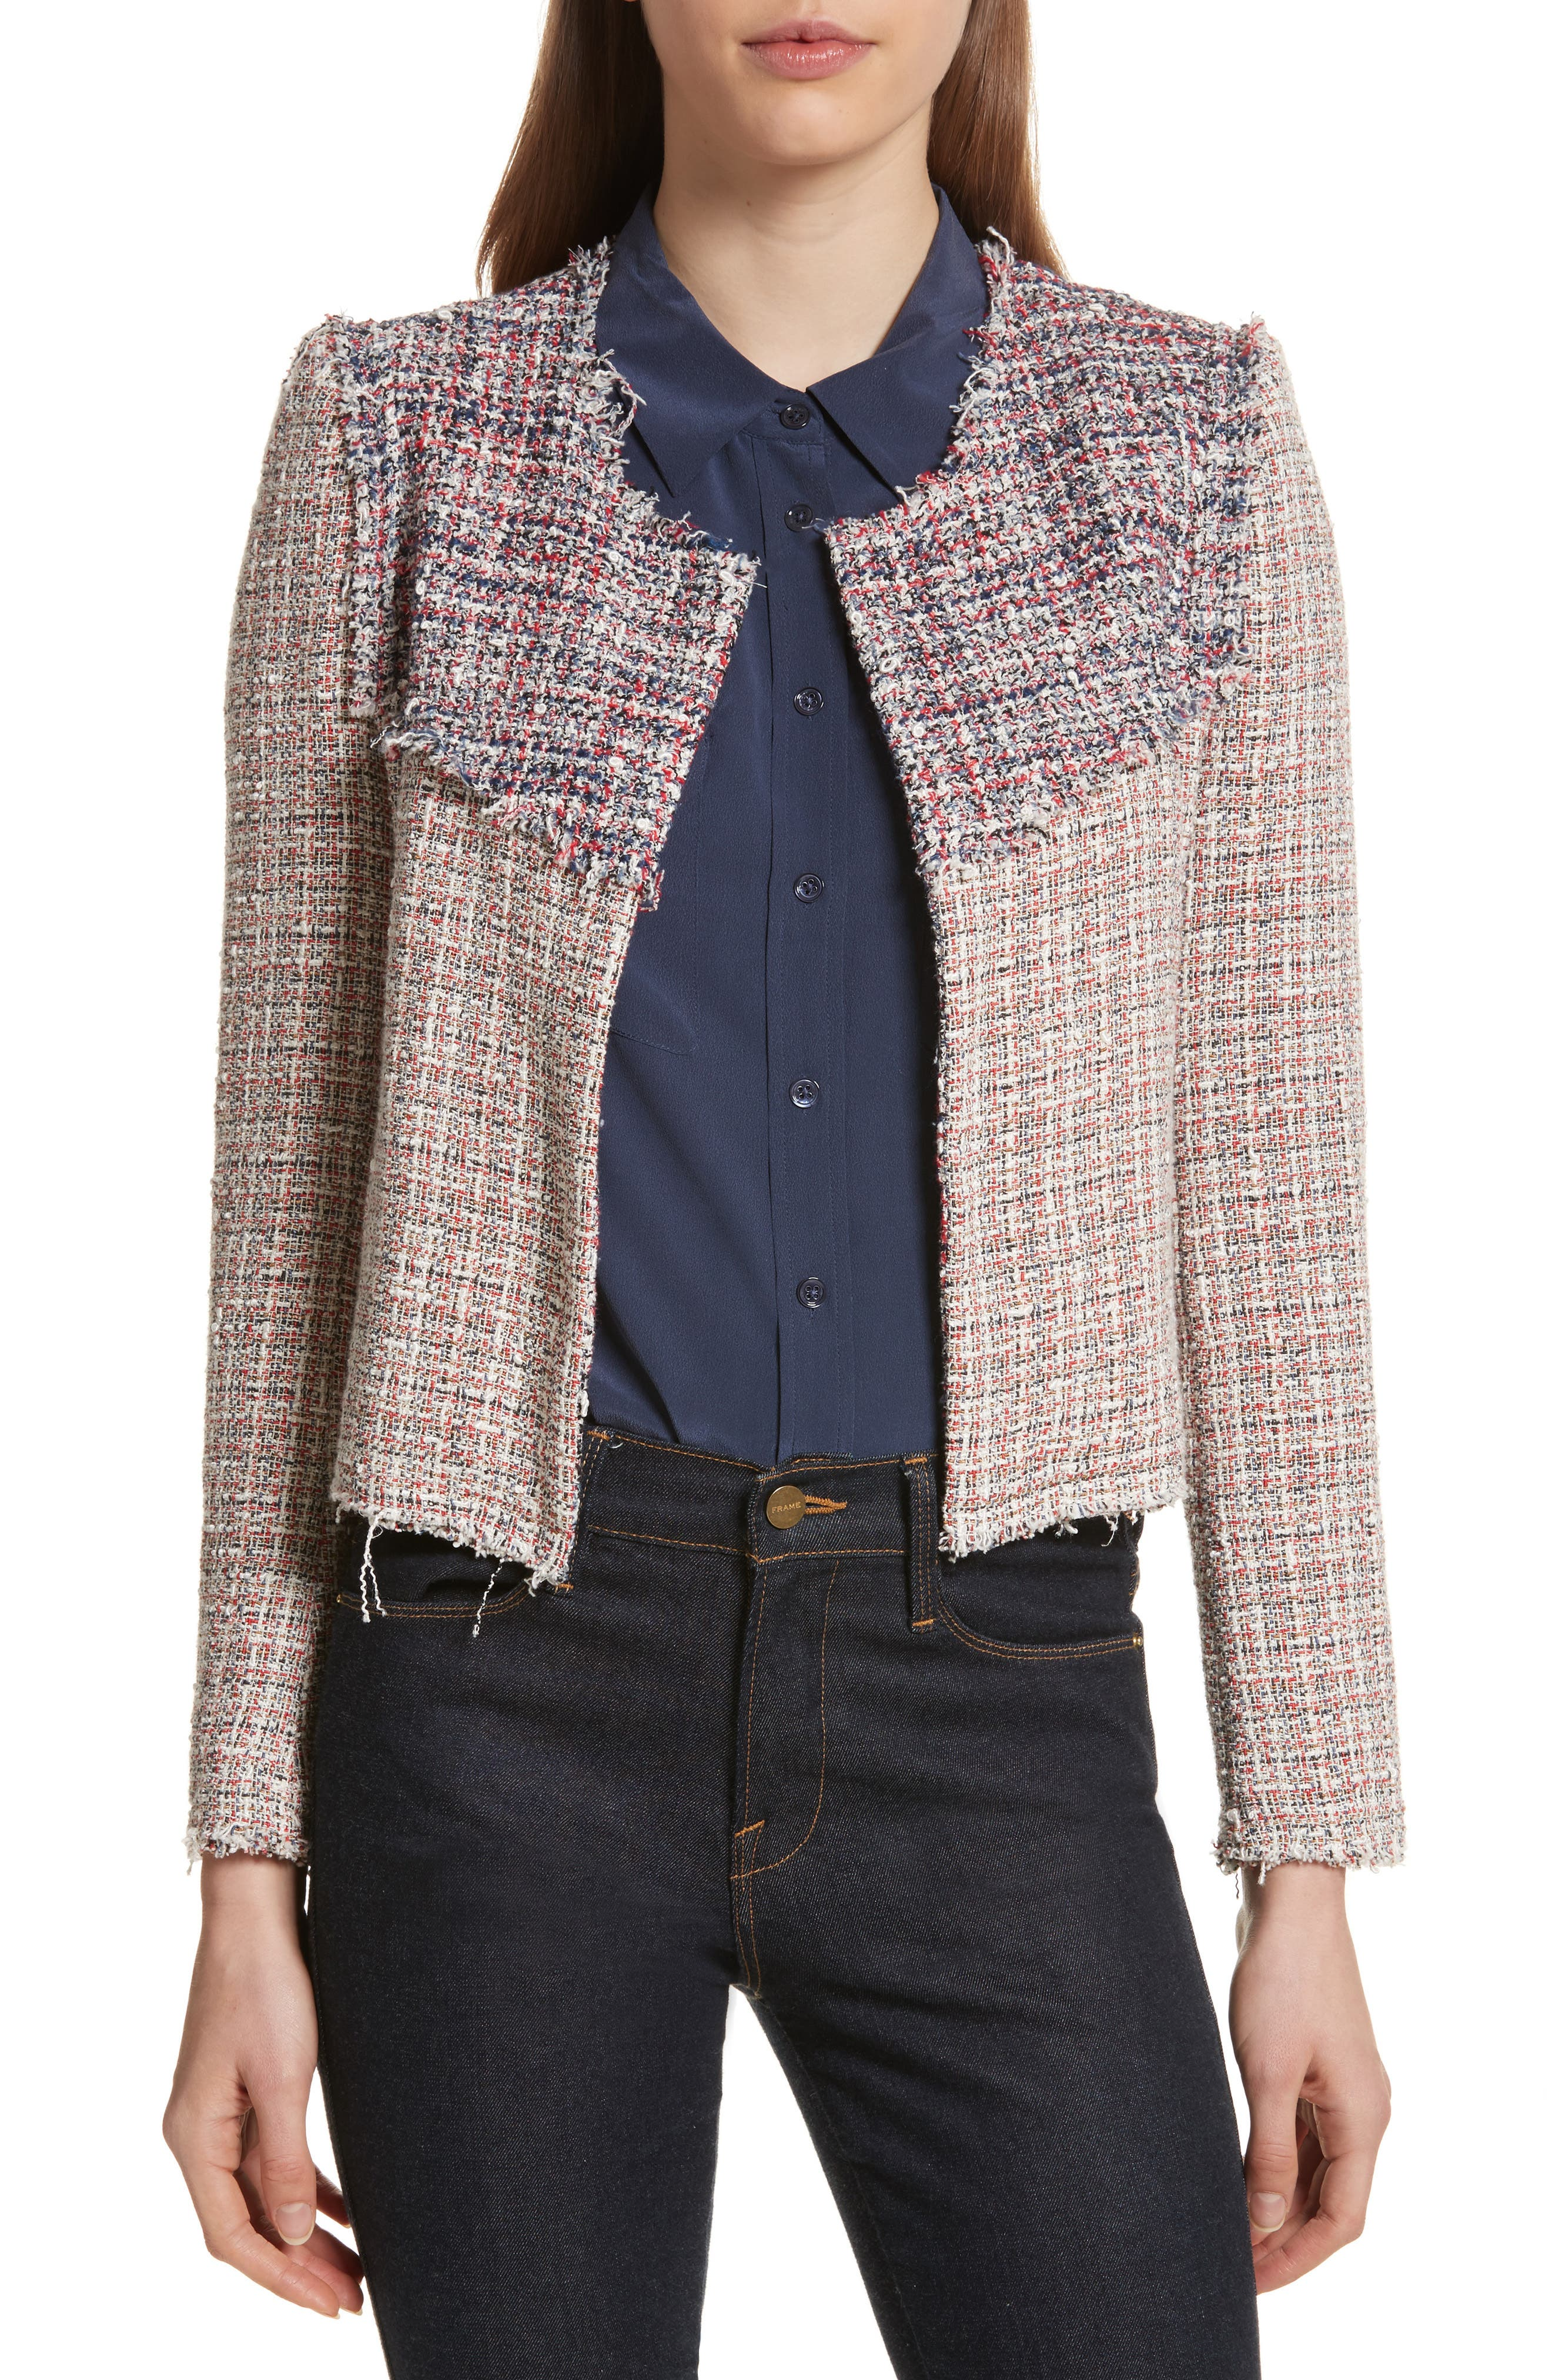 Walefa Tweed Jacket,                             Main thumbnail 1, color,                             651